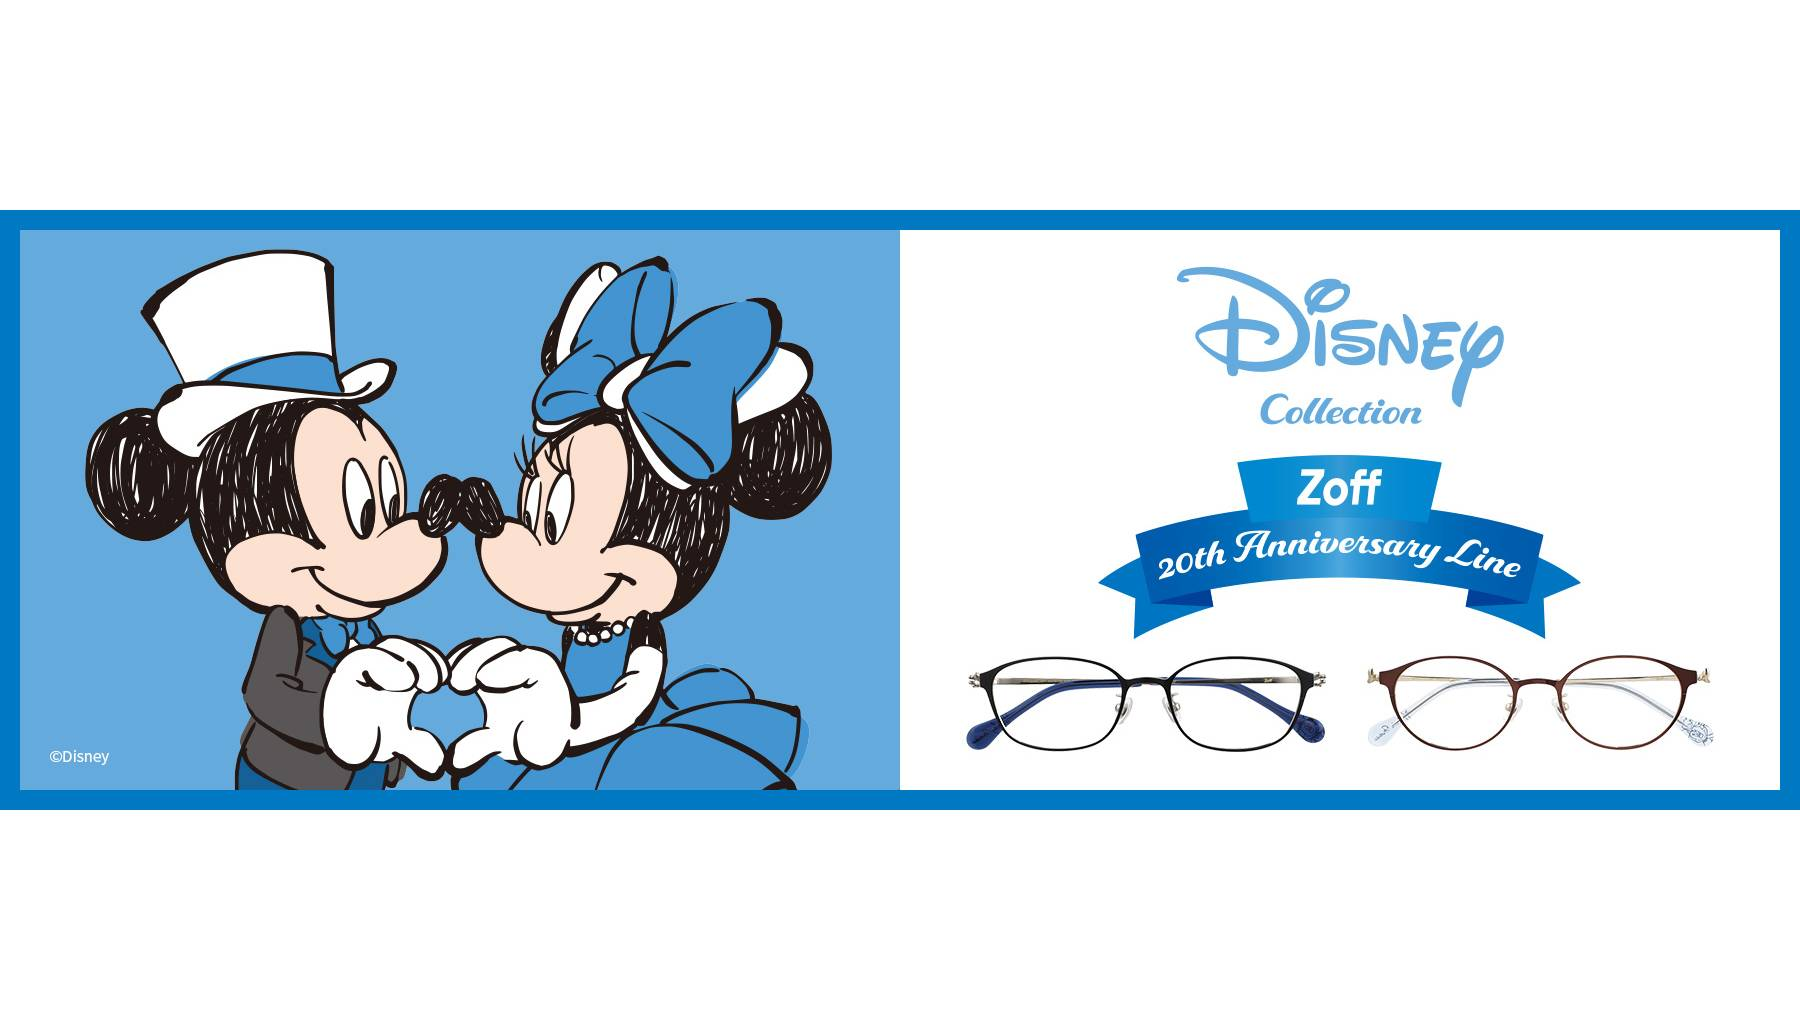 Disney Collection Zoff 20th Anniversary Line ディズニー 迪士尼1